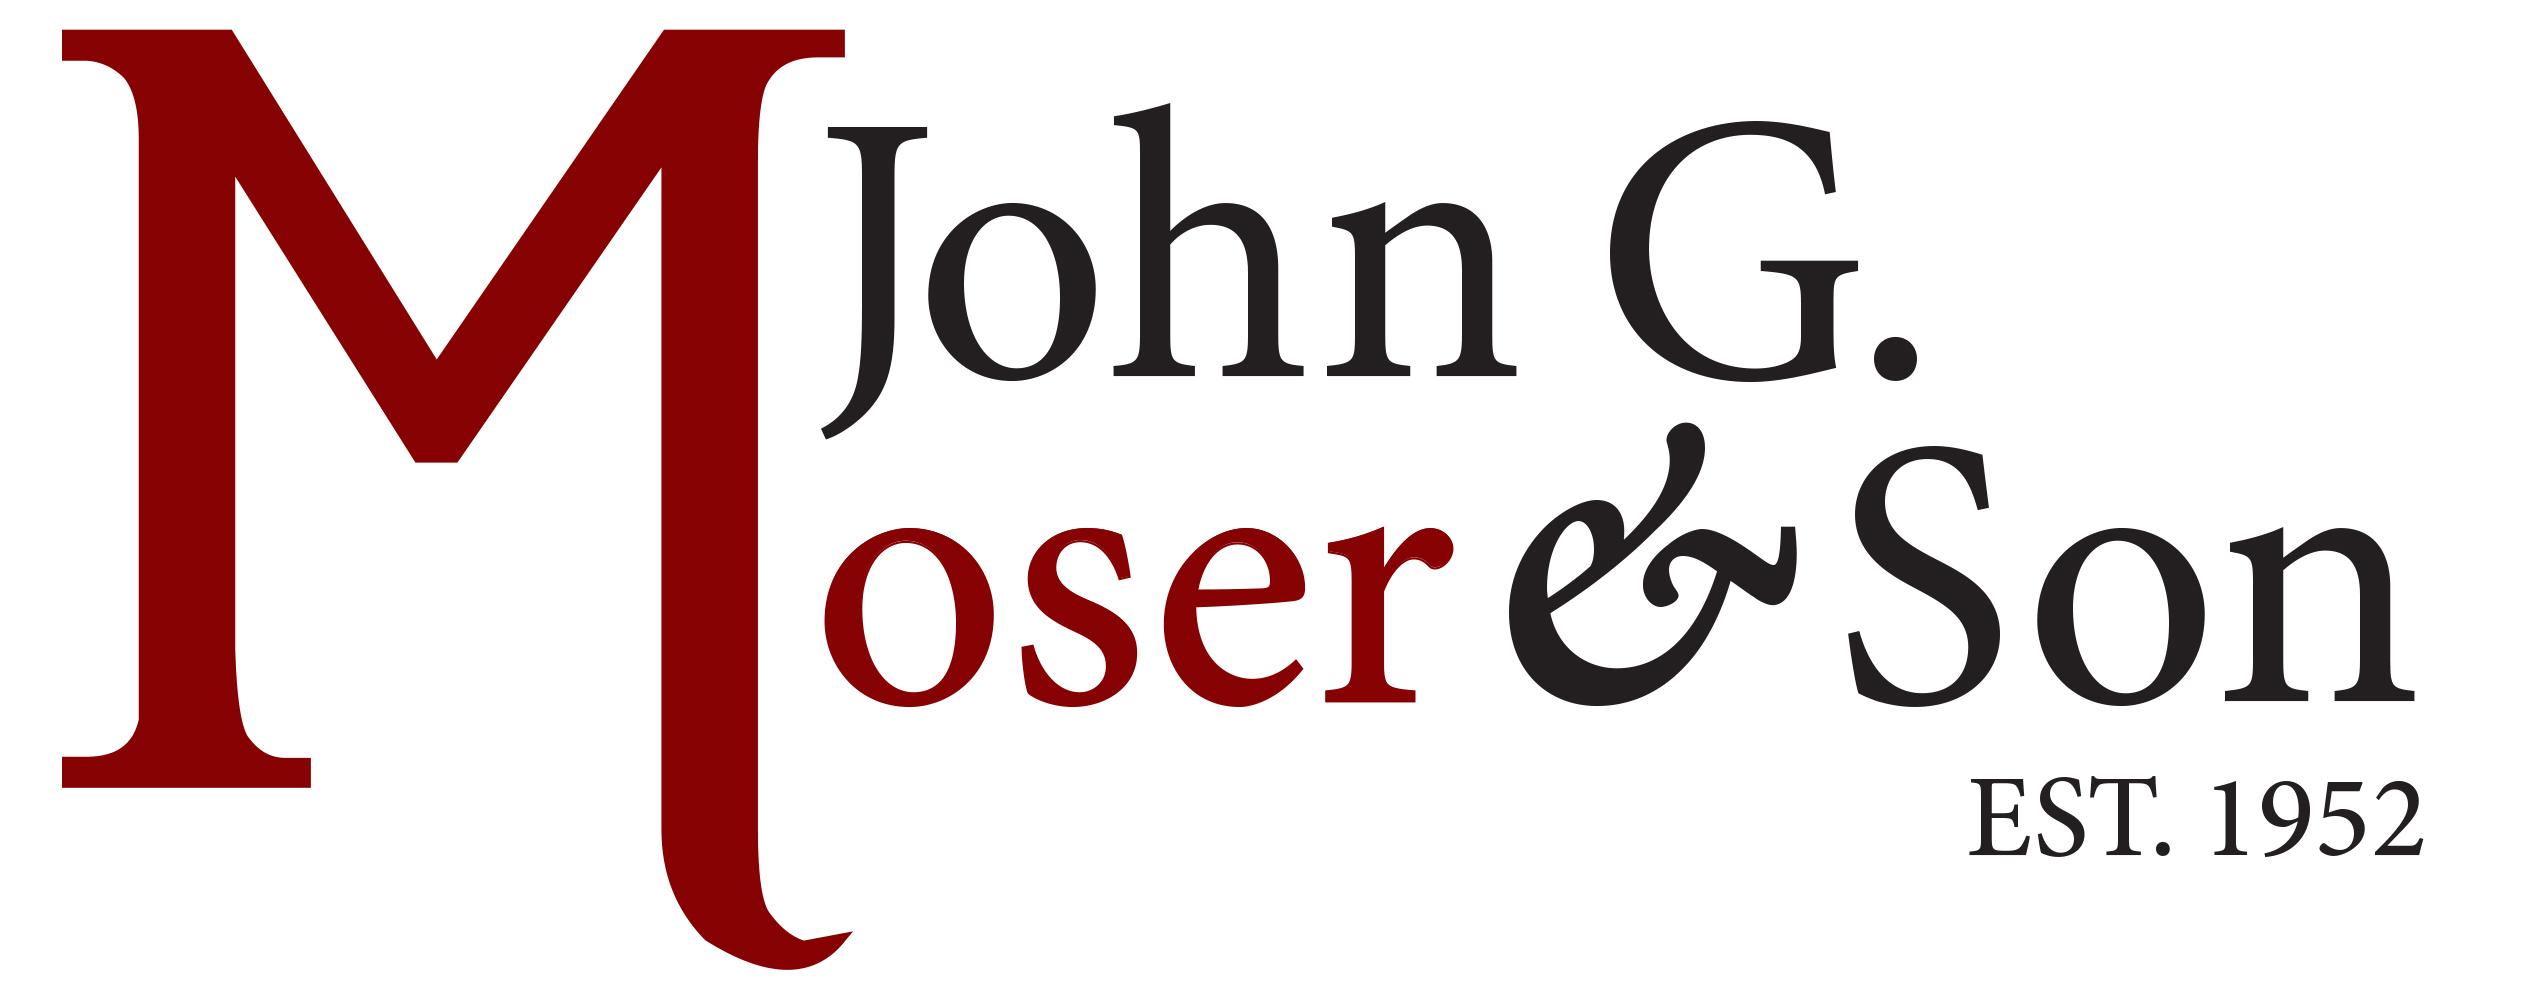 John G. Moser & Son, Inc. logo